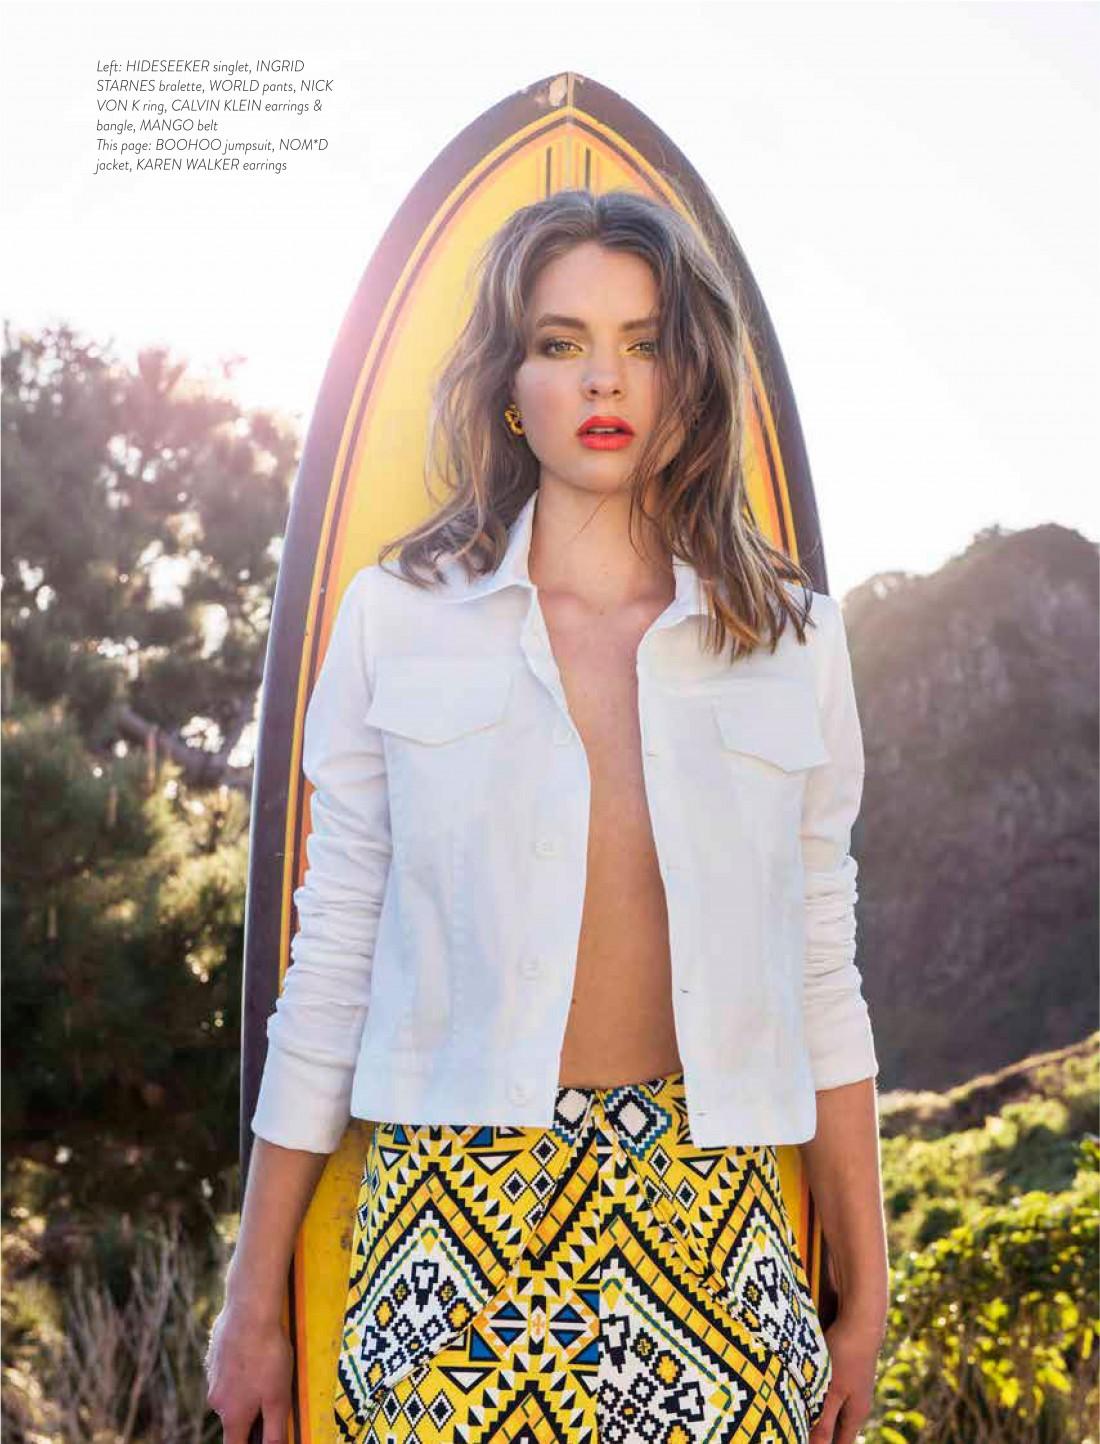 Eliza for Remix Magazine shot by Calypso Paoli